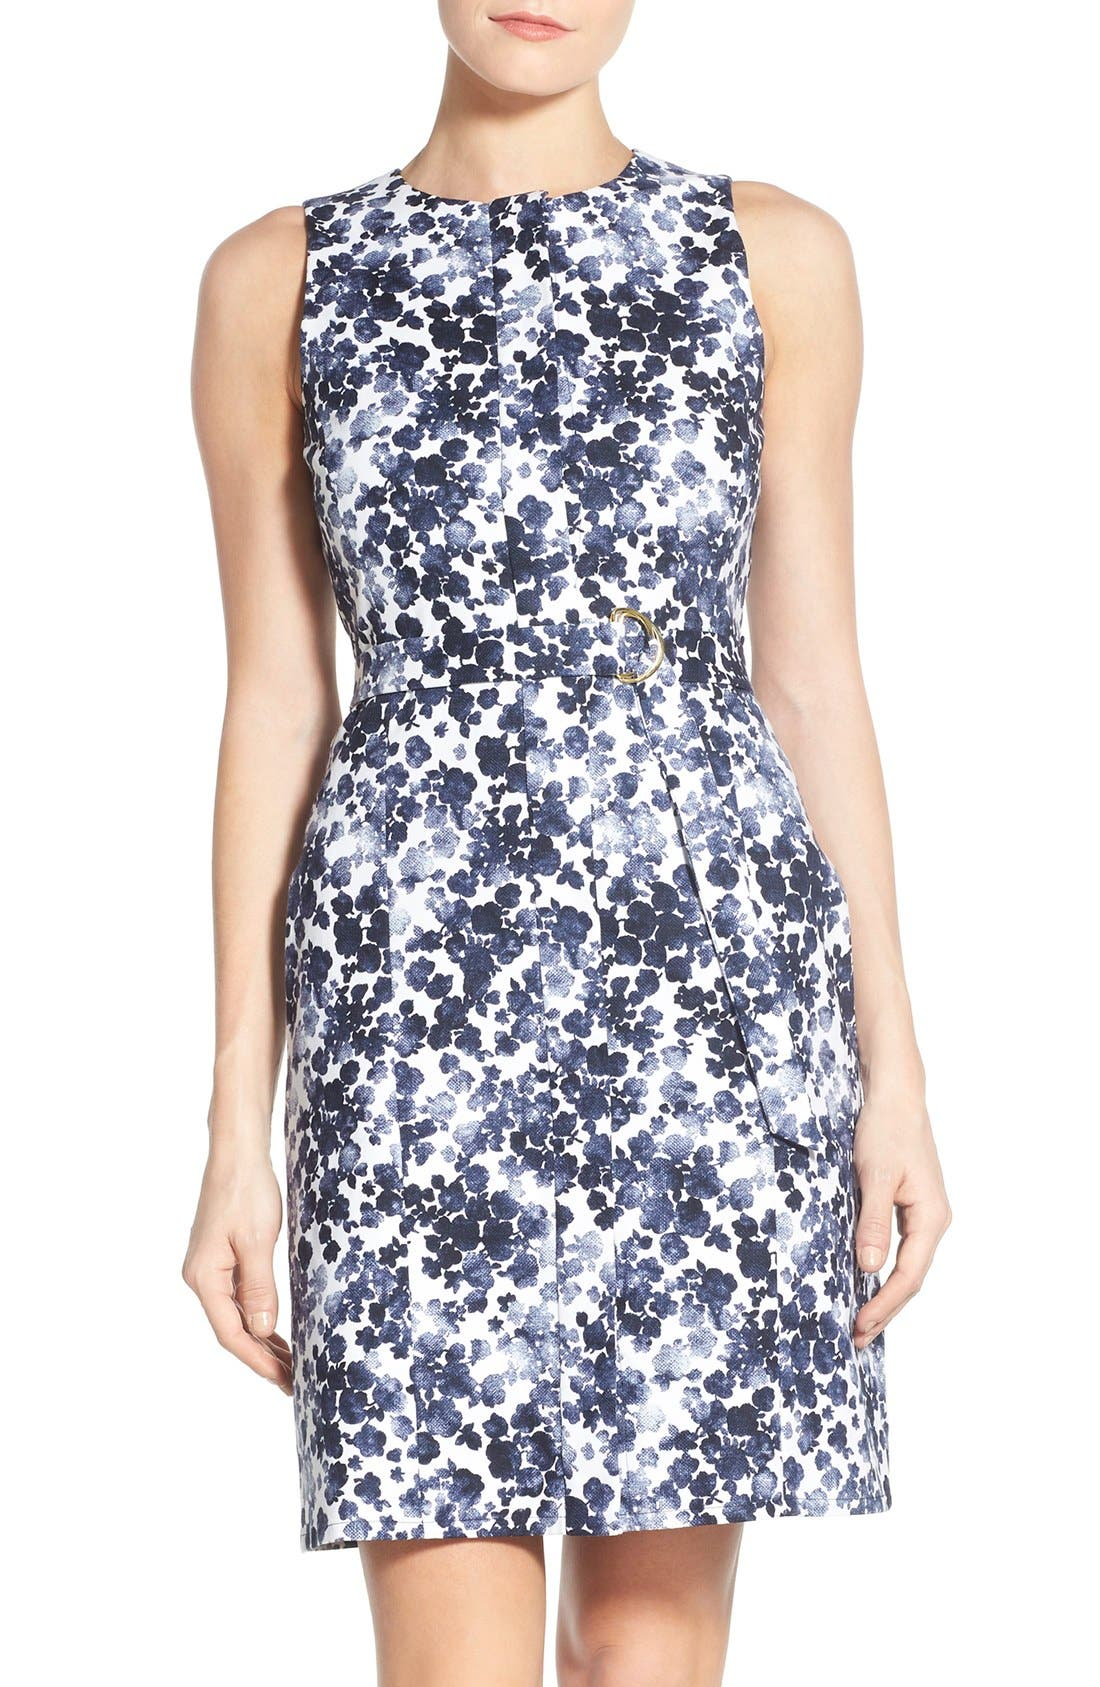 Main Image - MICHAEL Michael Kors 'Gemma' Print Belted A-Line Dress